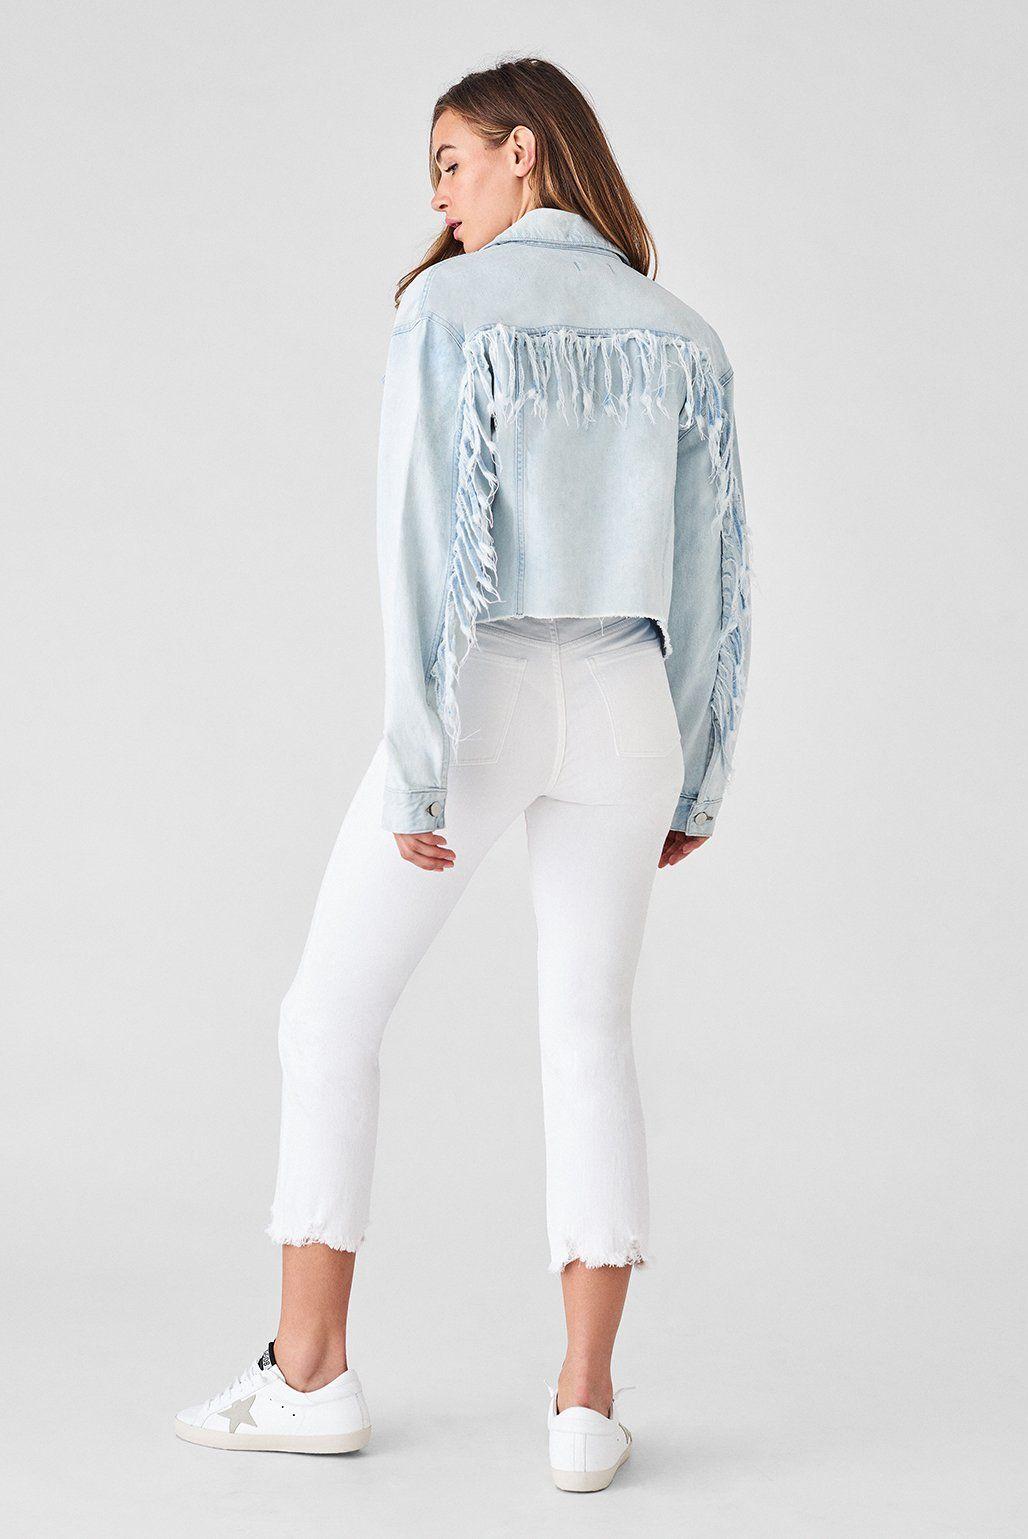 Editor's Choice Annie Cropped Jacket DL1961 $229.00 SHOP IT